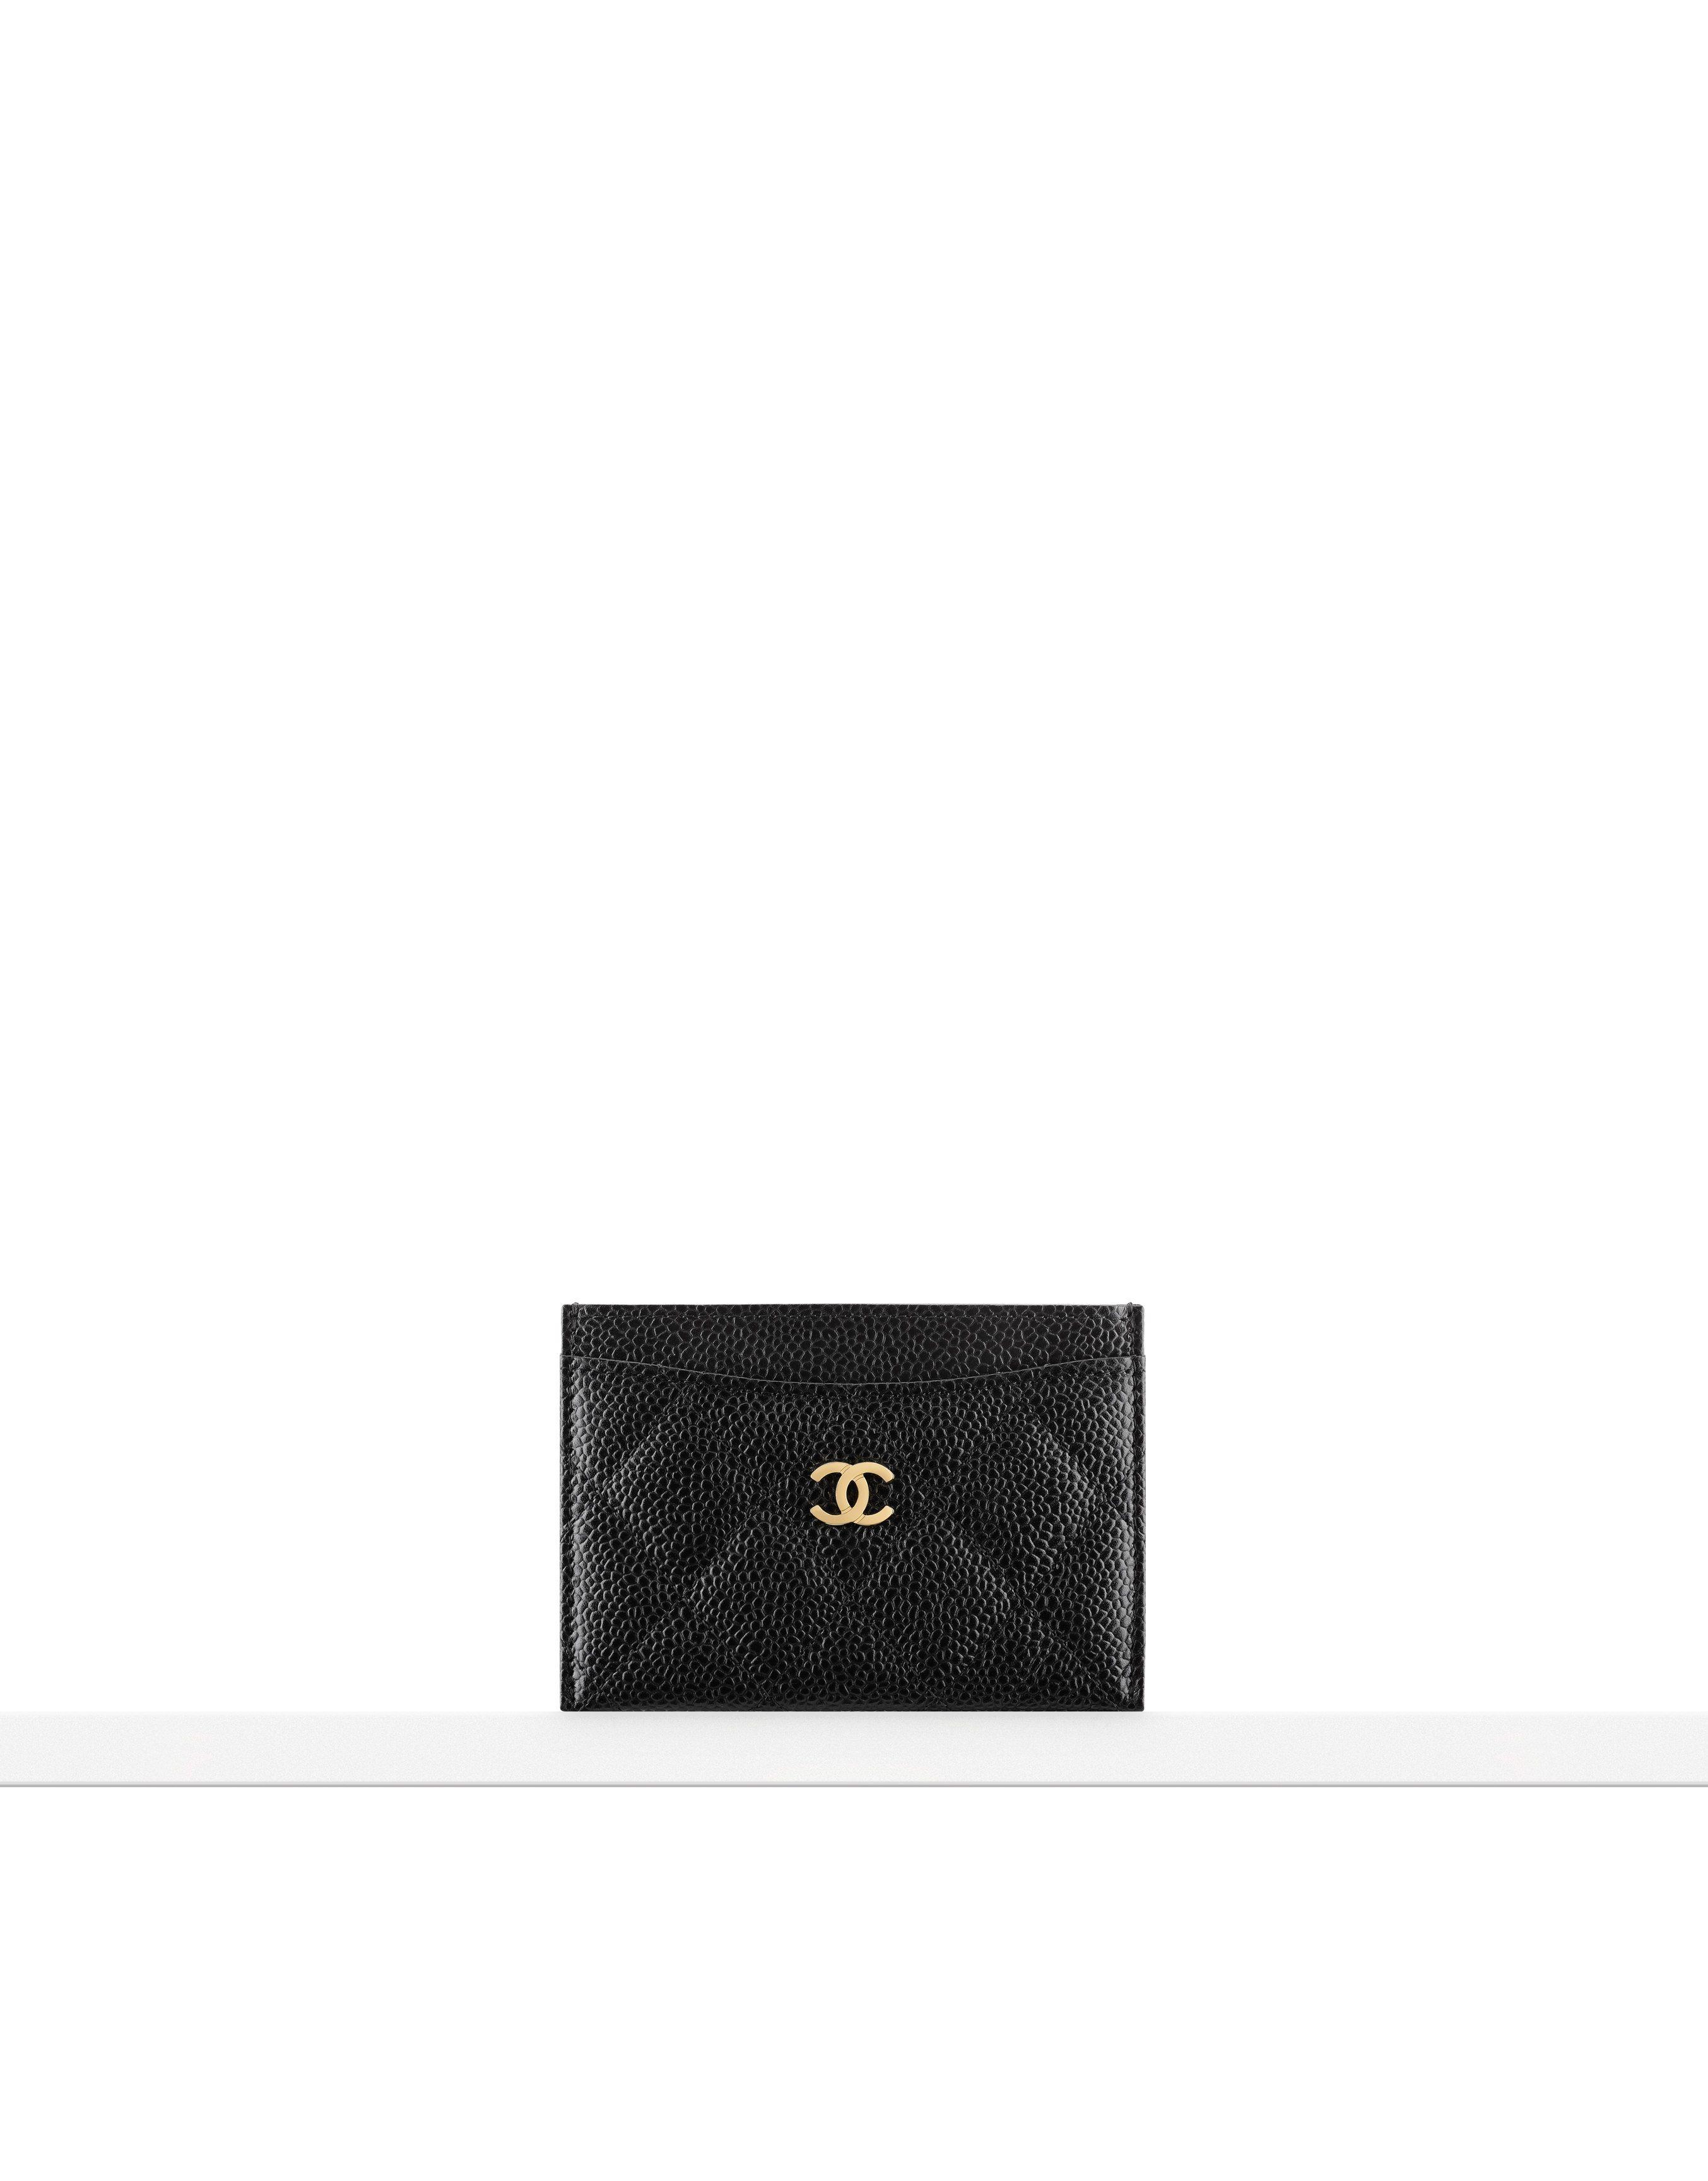 986e29025626 chanel card holder // grained calfskin & gold metal-black & burgundy ...